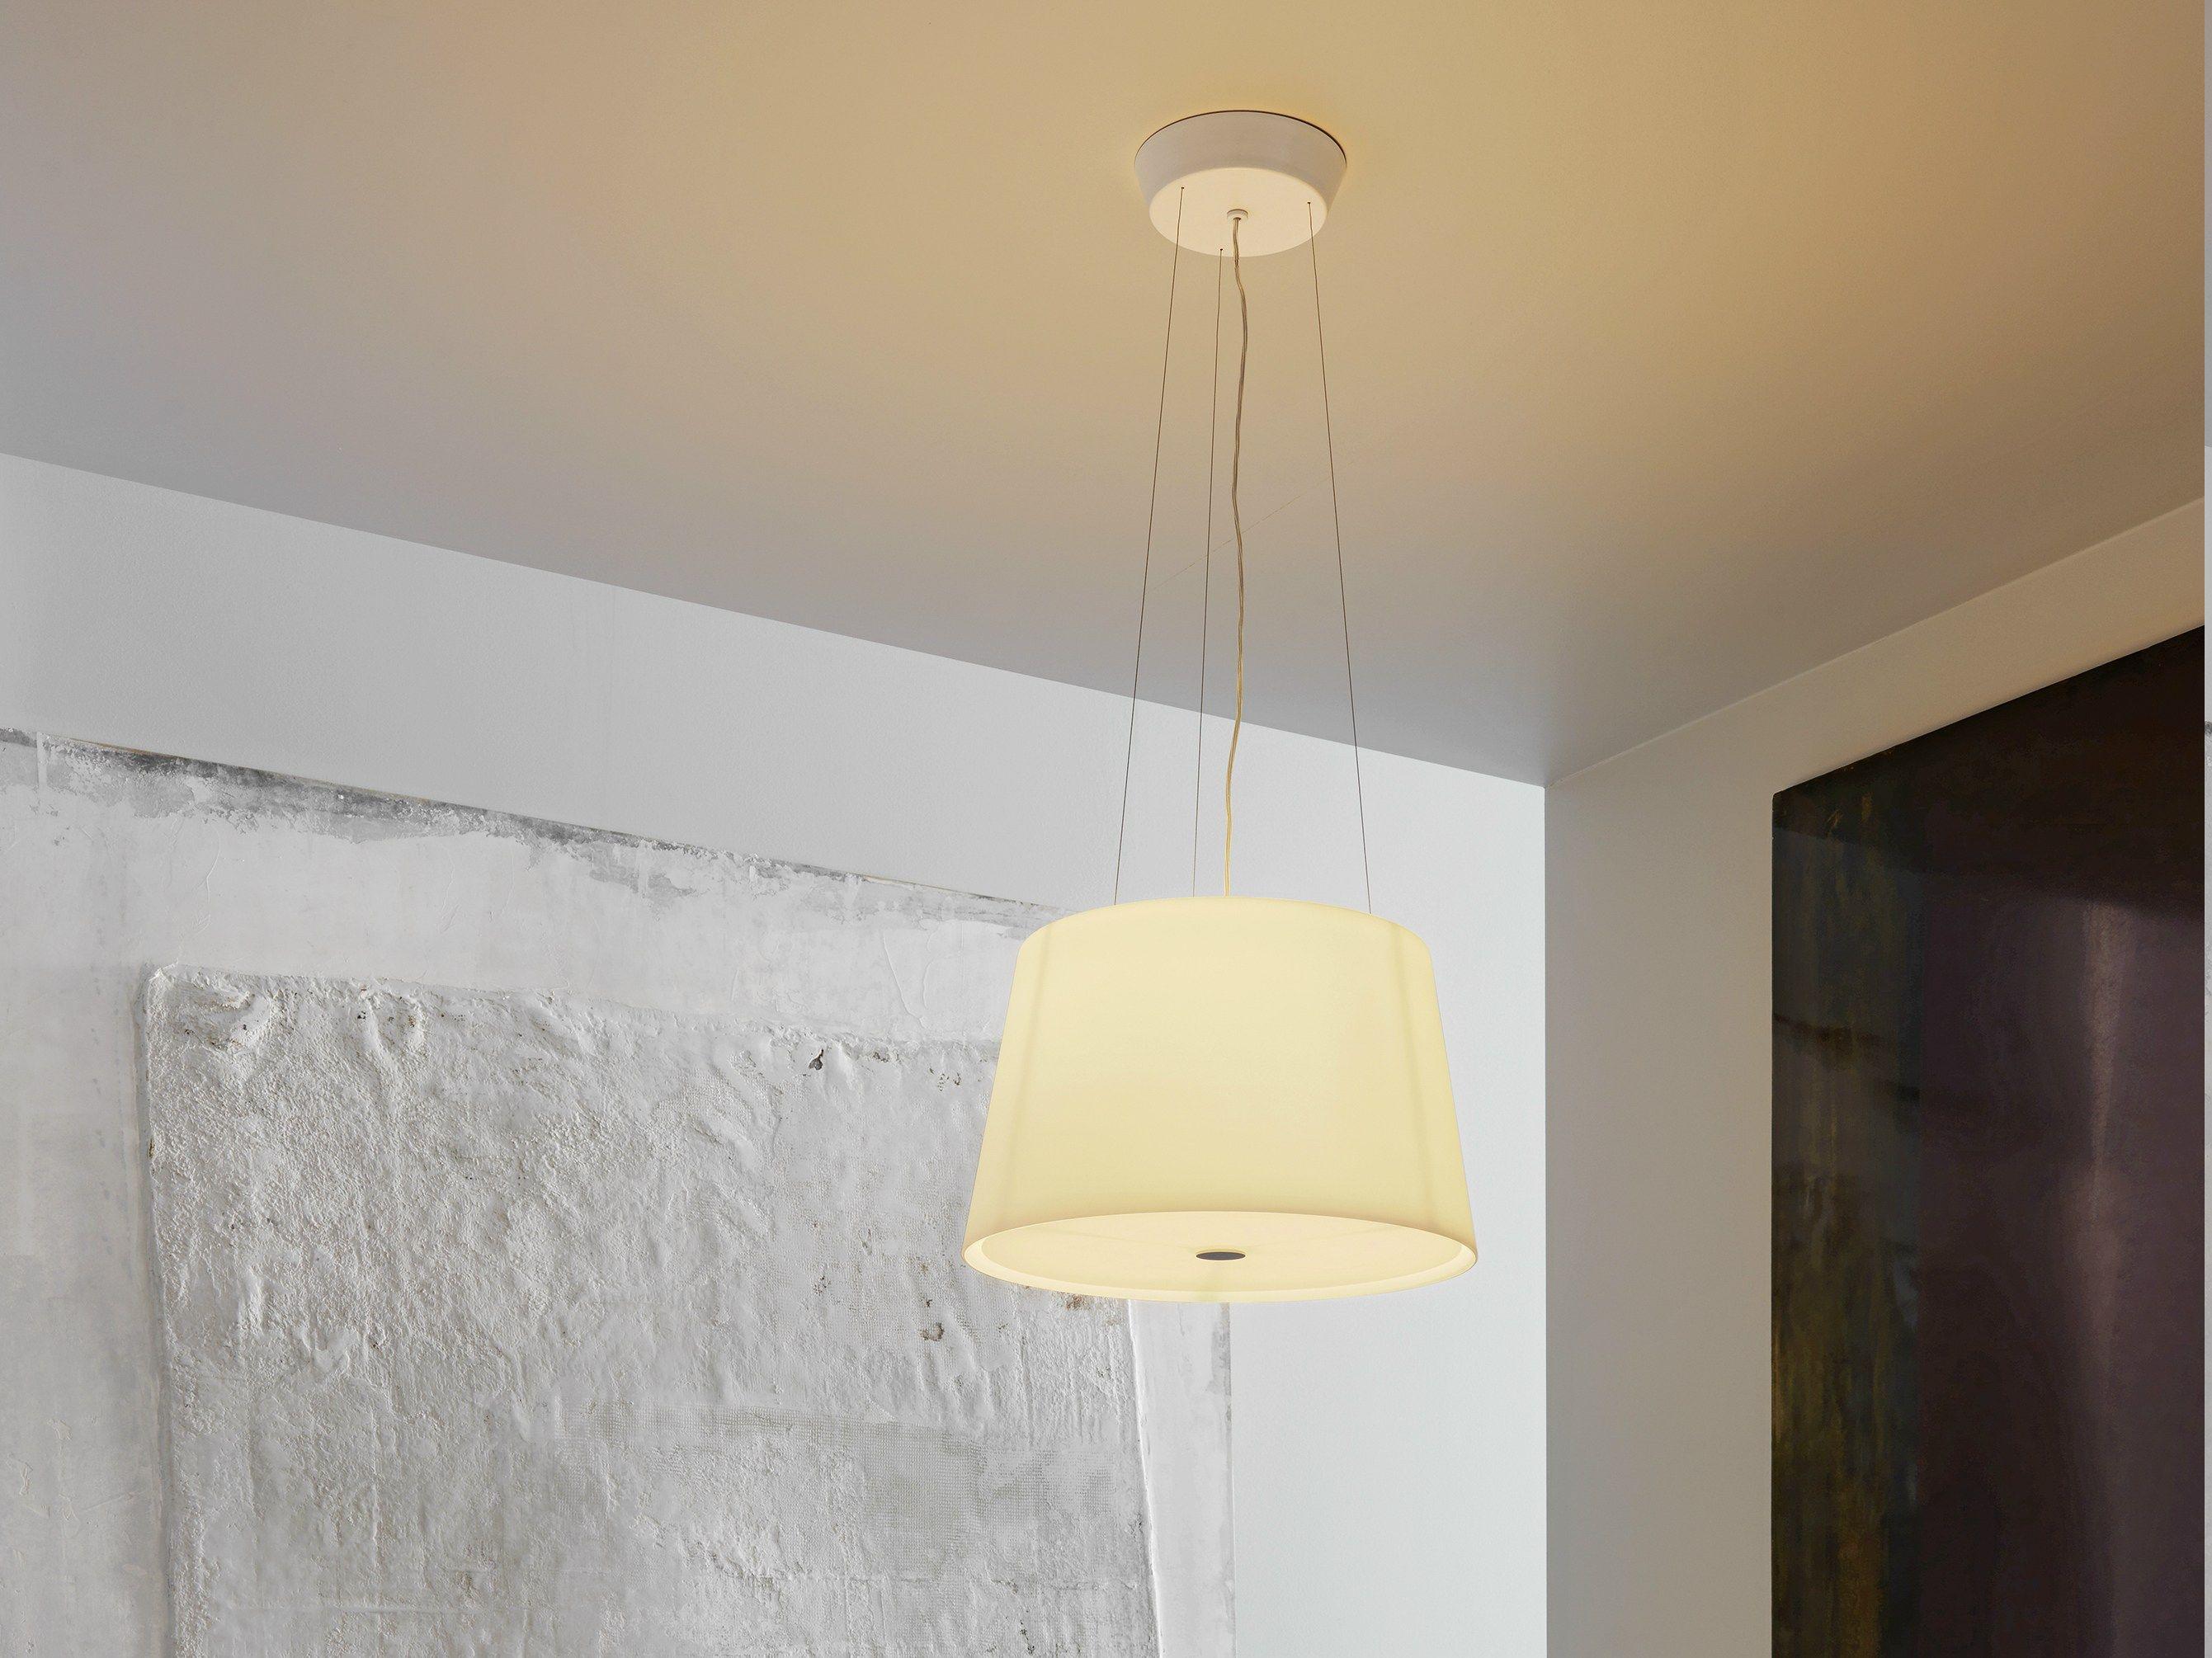 SETAREH | Lampada a sospensione Collezione Setareh By FontanaArte